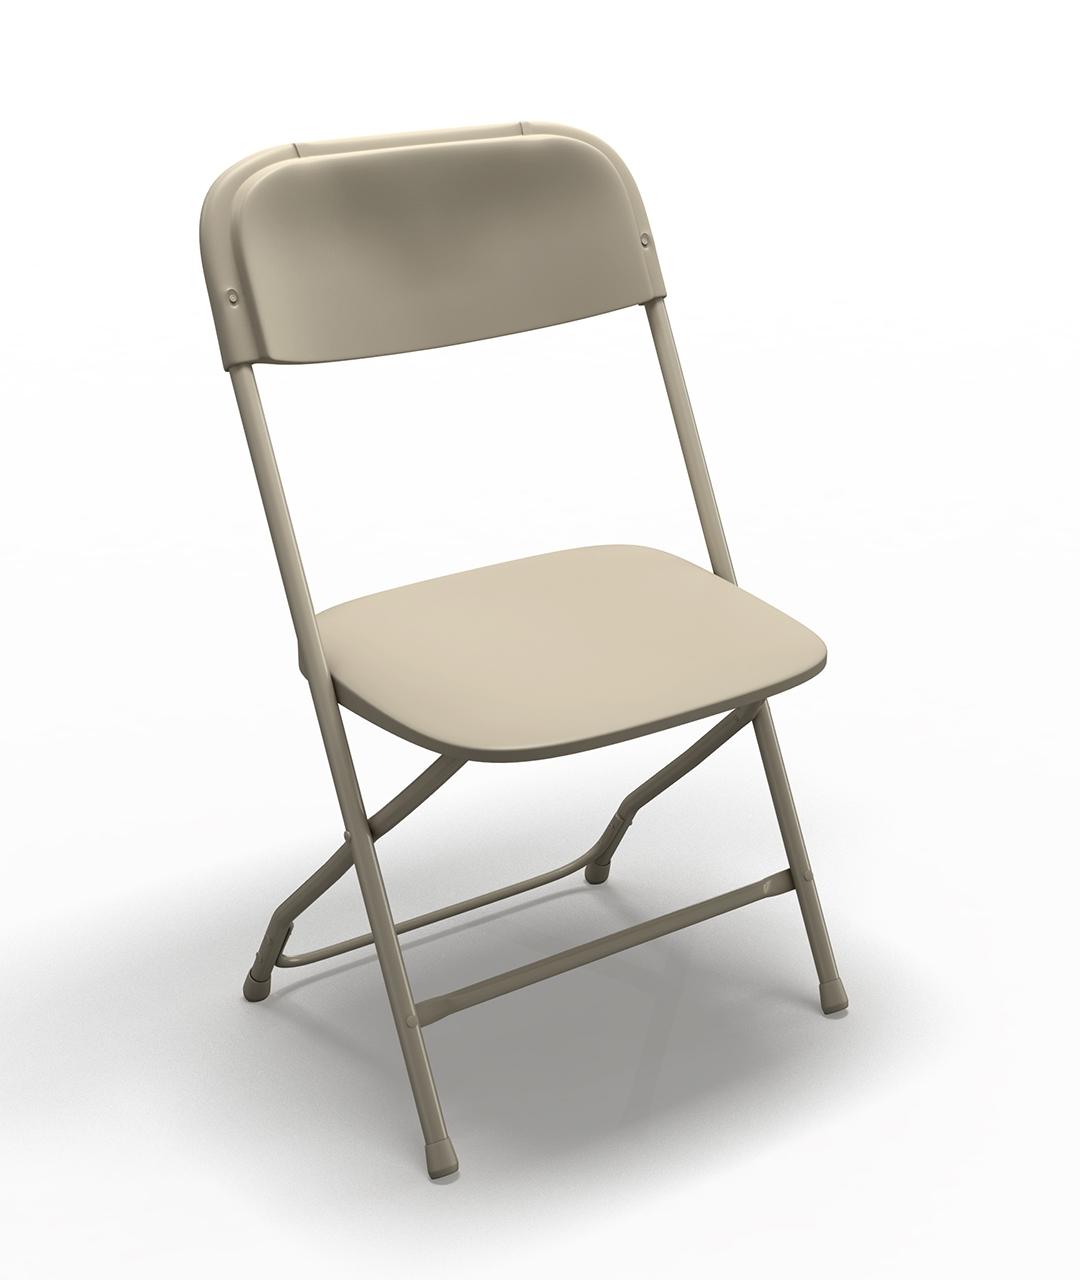 Pleasant Beige Samsonite Folding Chair Adult Folding Chair Pdpeps Interior Chair Design Pdpepsorg